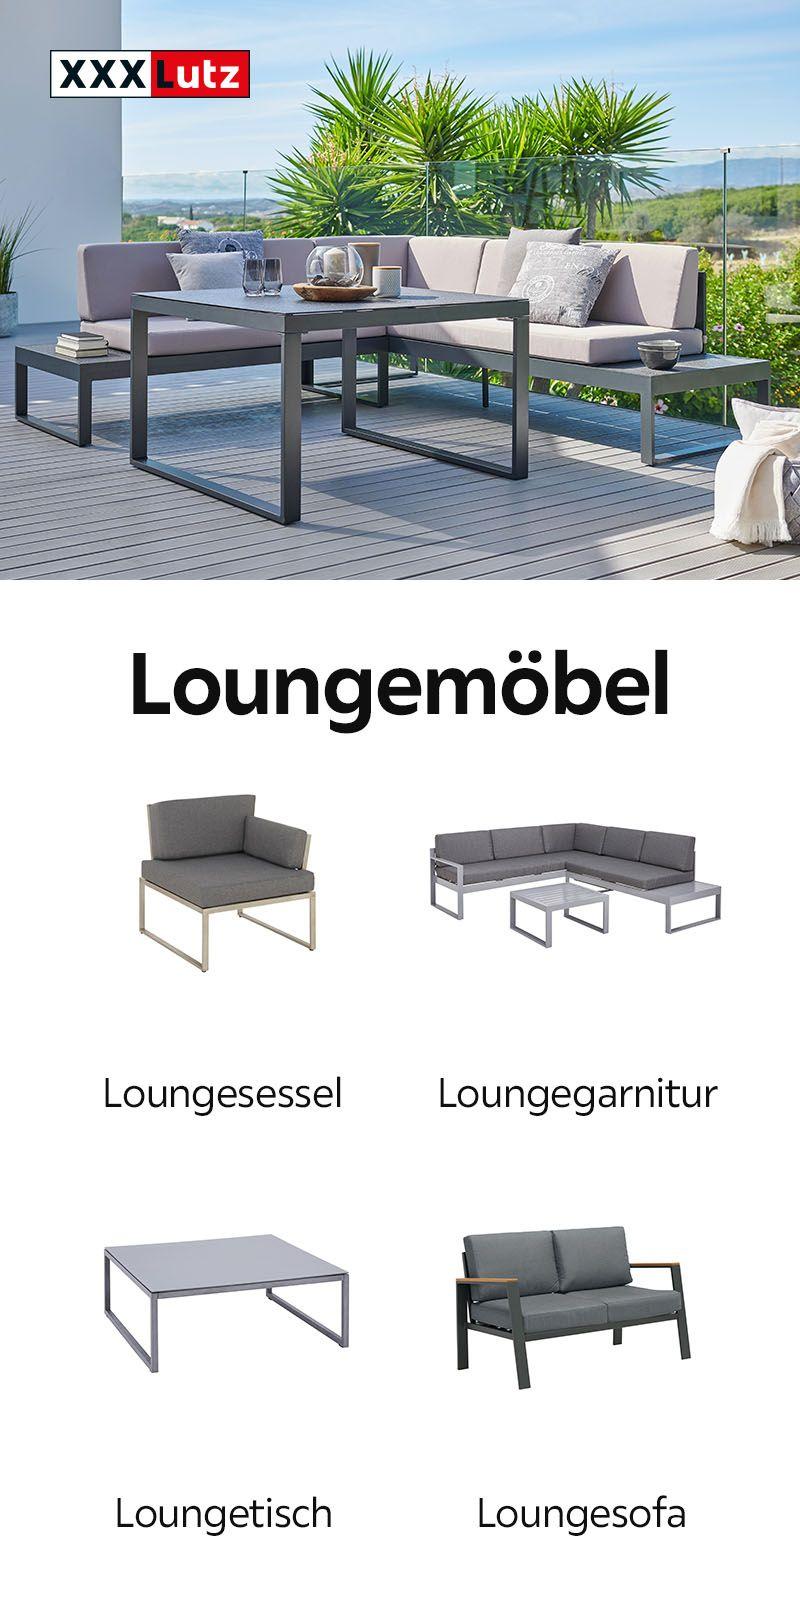 Loungemobel Loungesesseln Loungegarnitur Loungetische